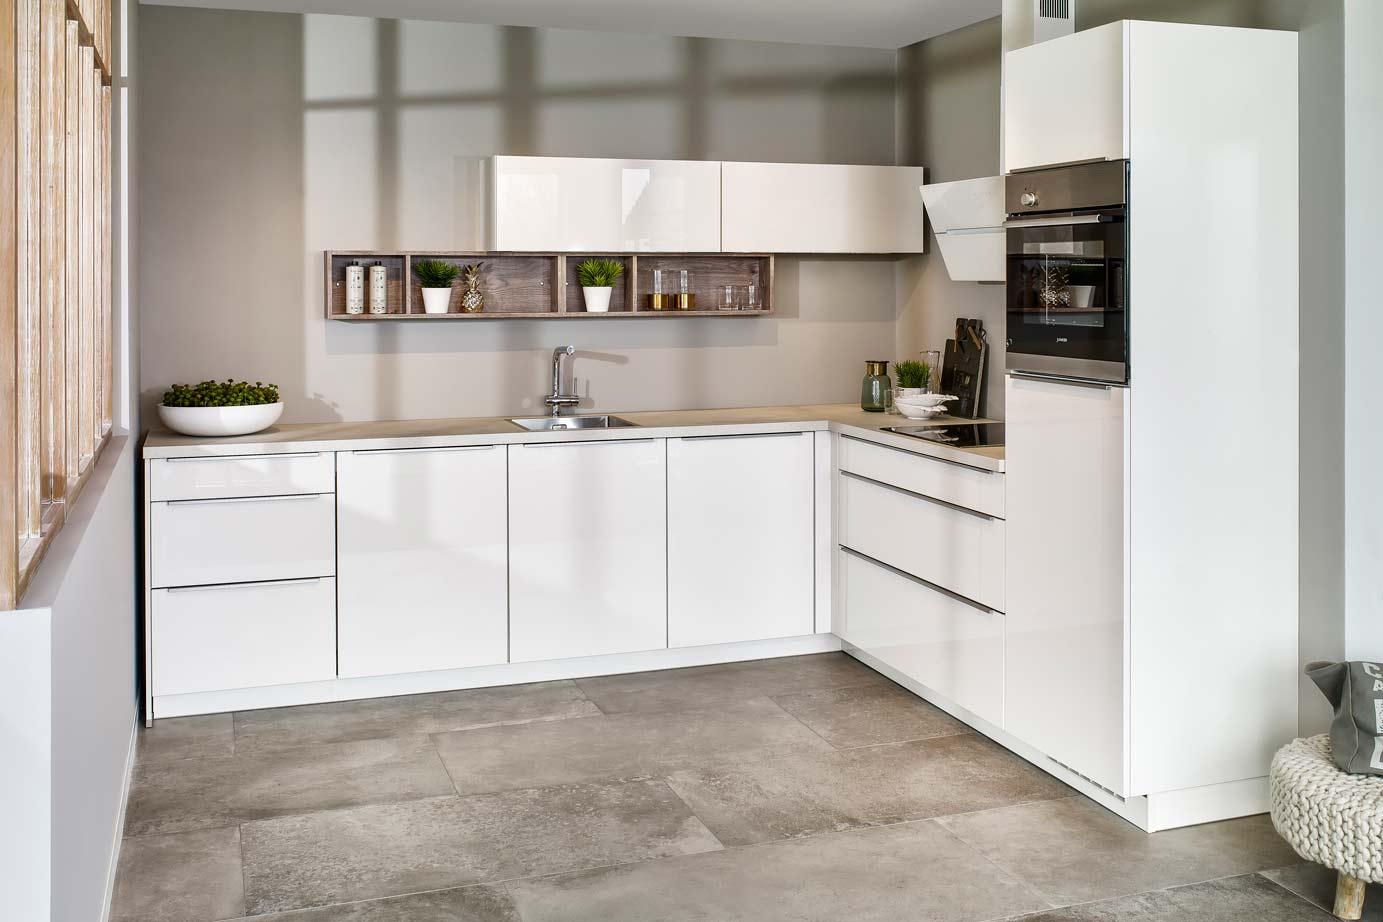 Hoogglans Witte Keuken : Hoogglans keuken wit fzy agneswamu